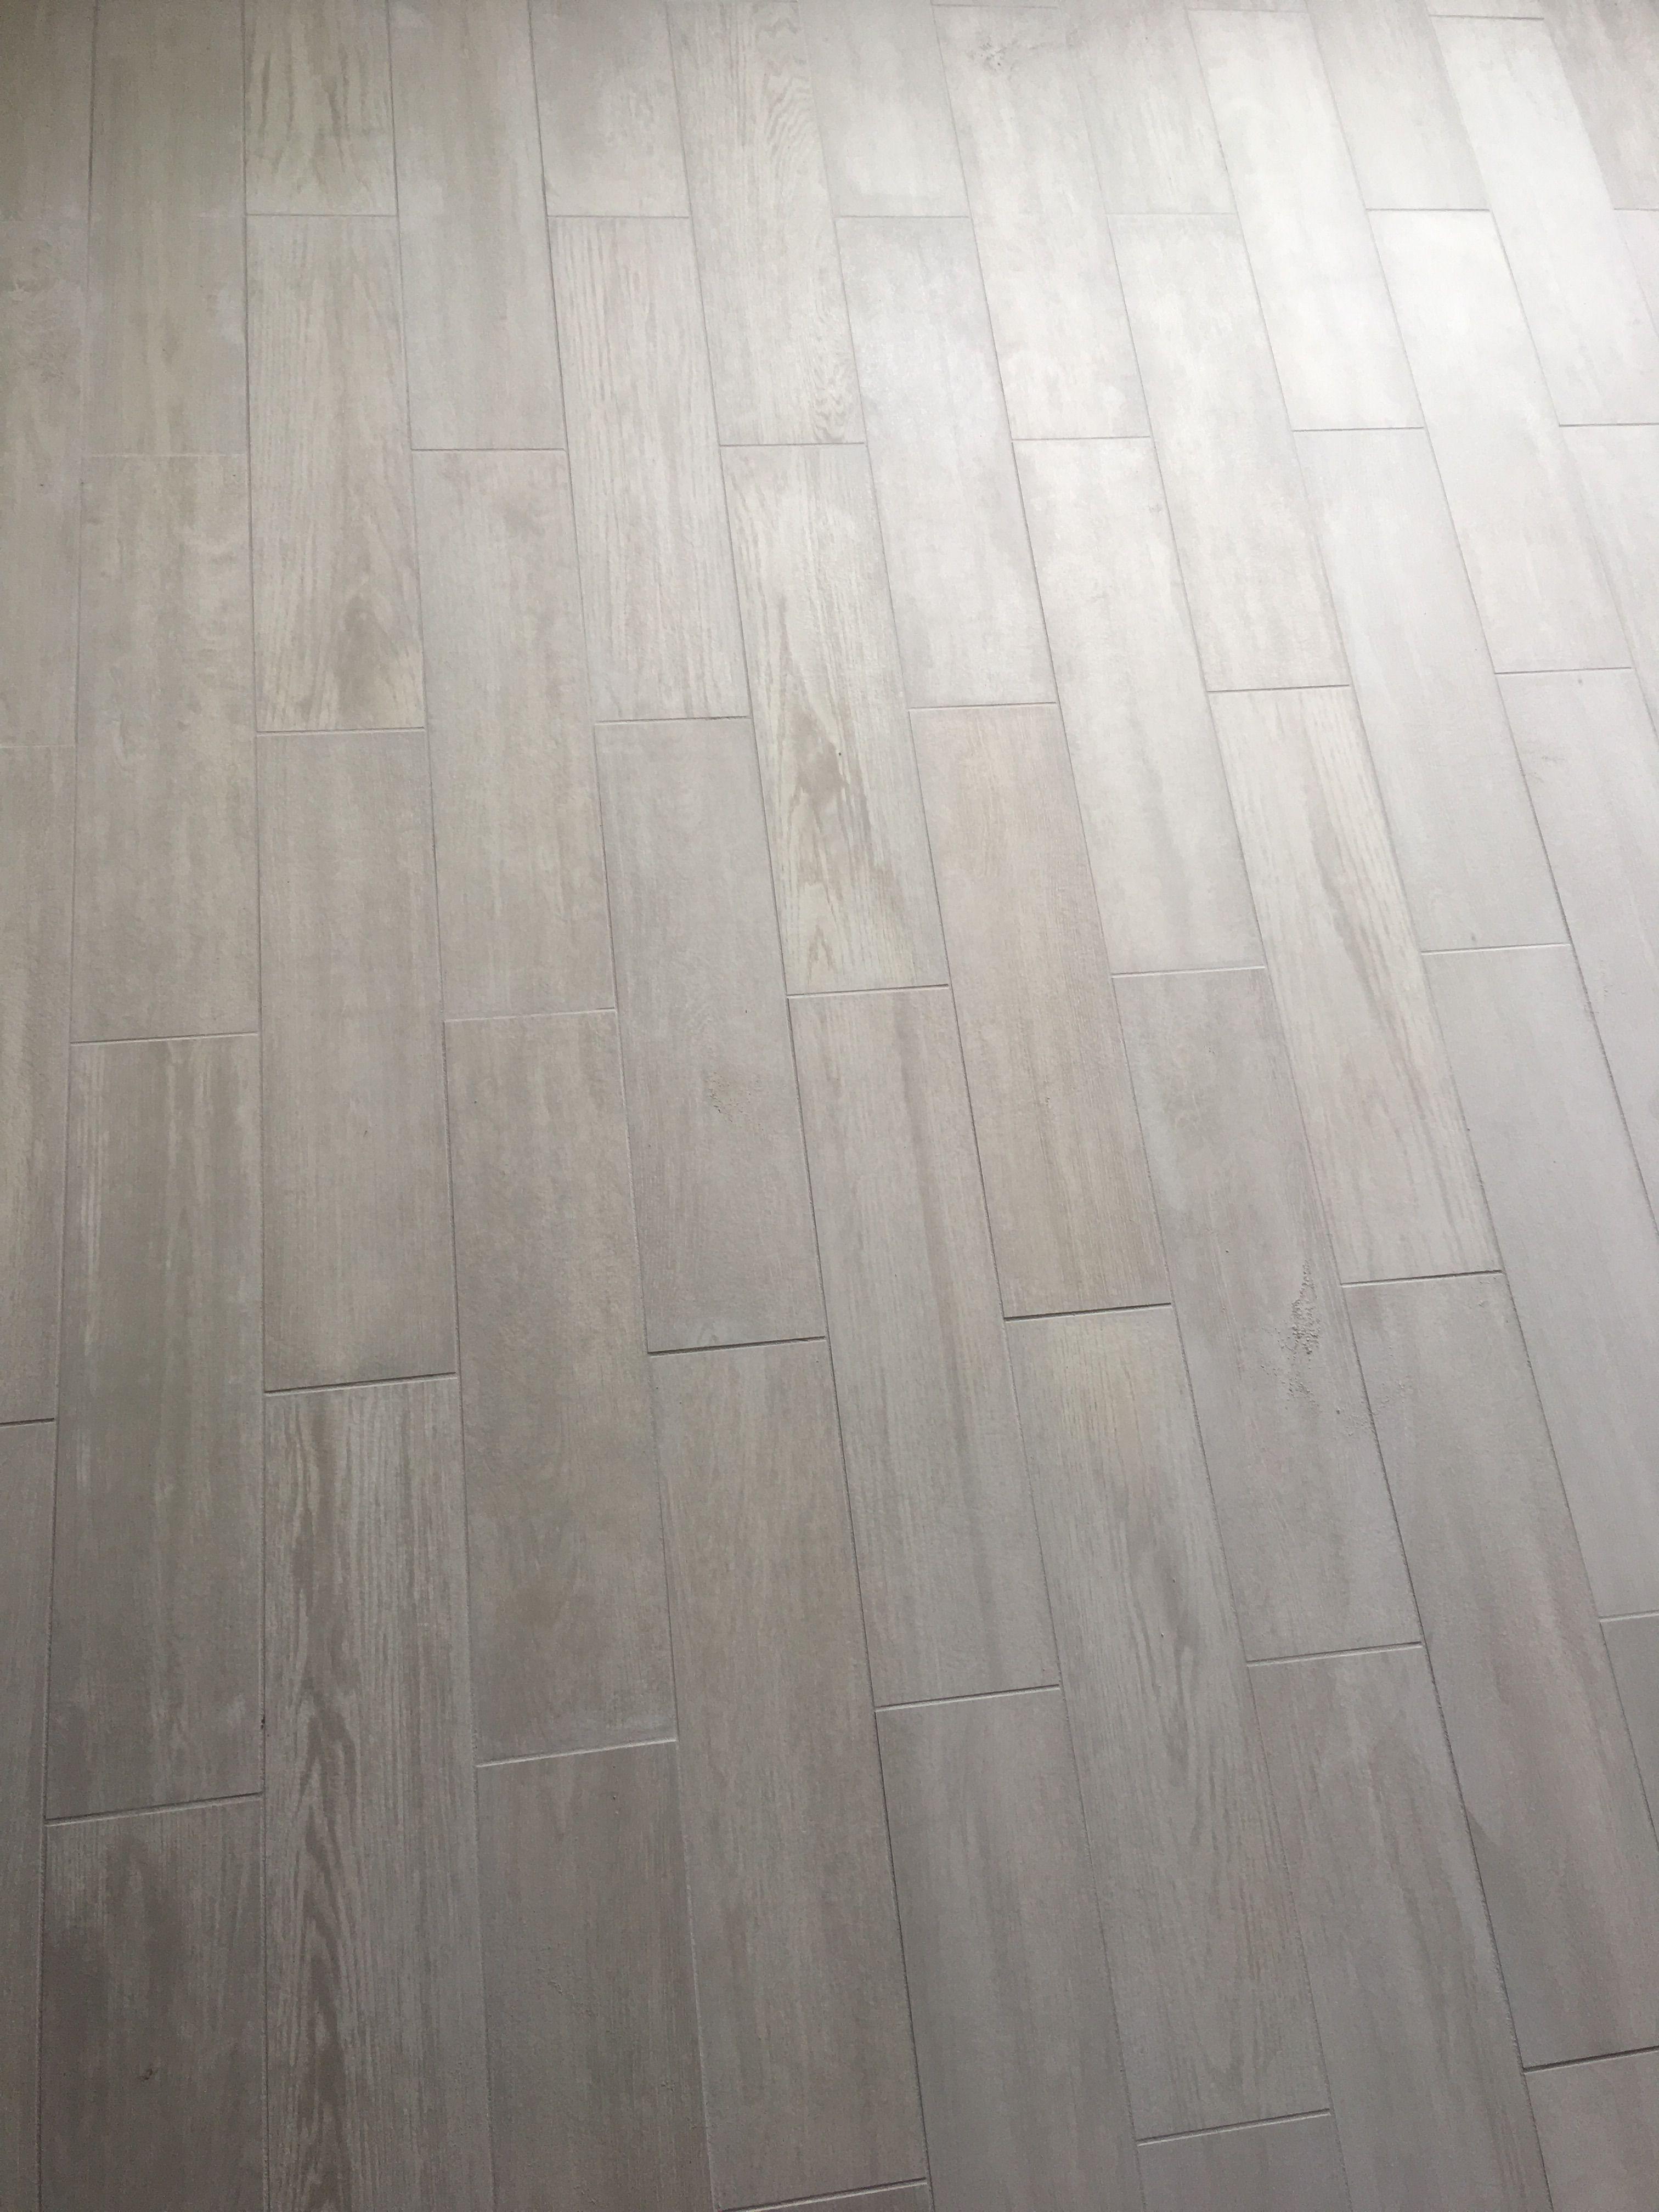 Lowes eldon white wood look porcelain tile with silver grout from lowes eldon white wood look porcelain tile with silver grout from menards dailygadgetfo Gallery